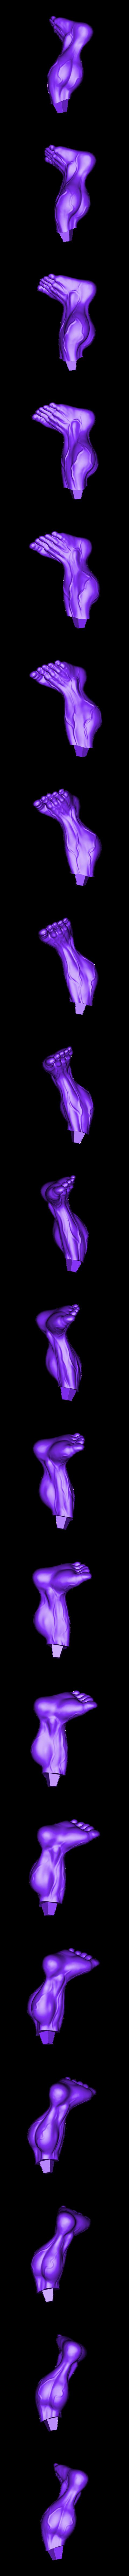 Rleg_300mm.stl Download STL file Hulk Angry - Super Hero - Marvel 3D print model • 3D print model, Bstar3Dart